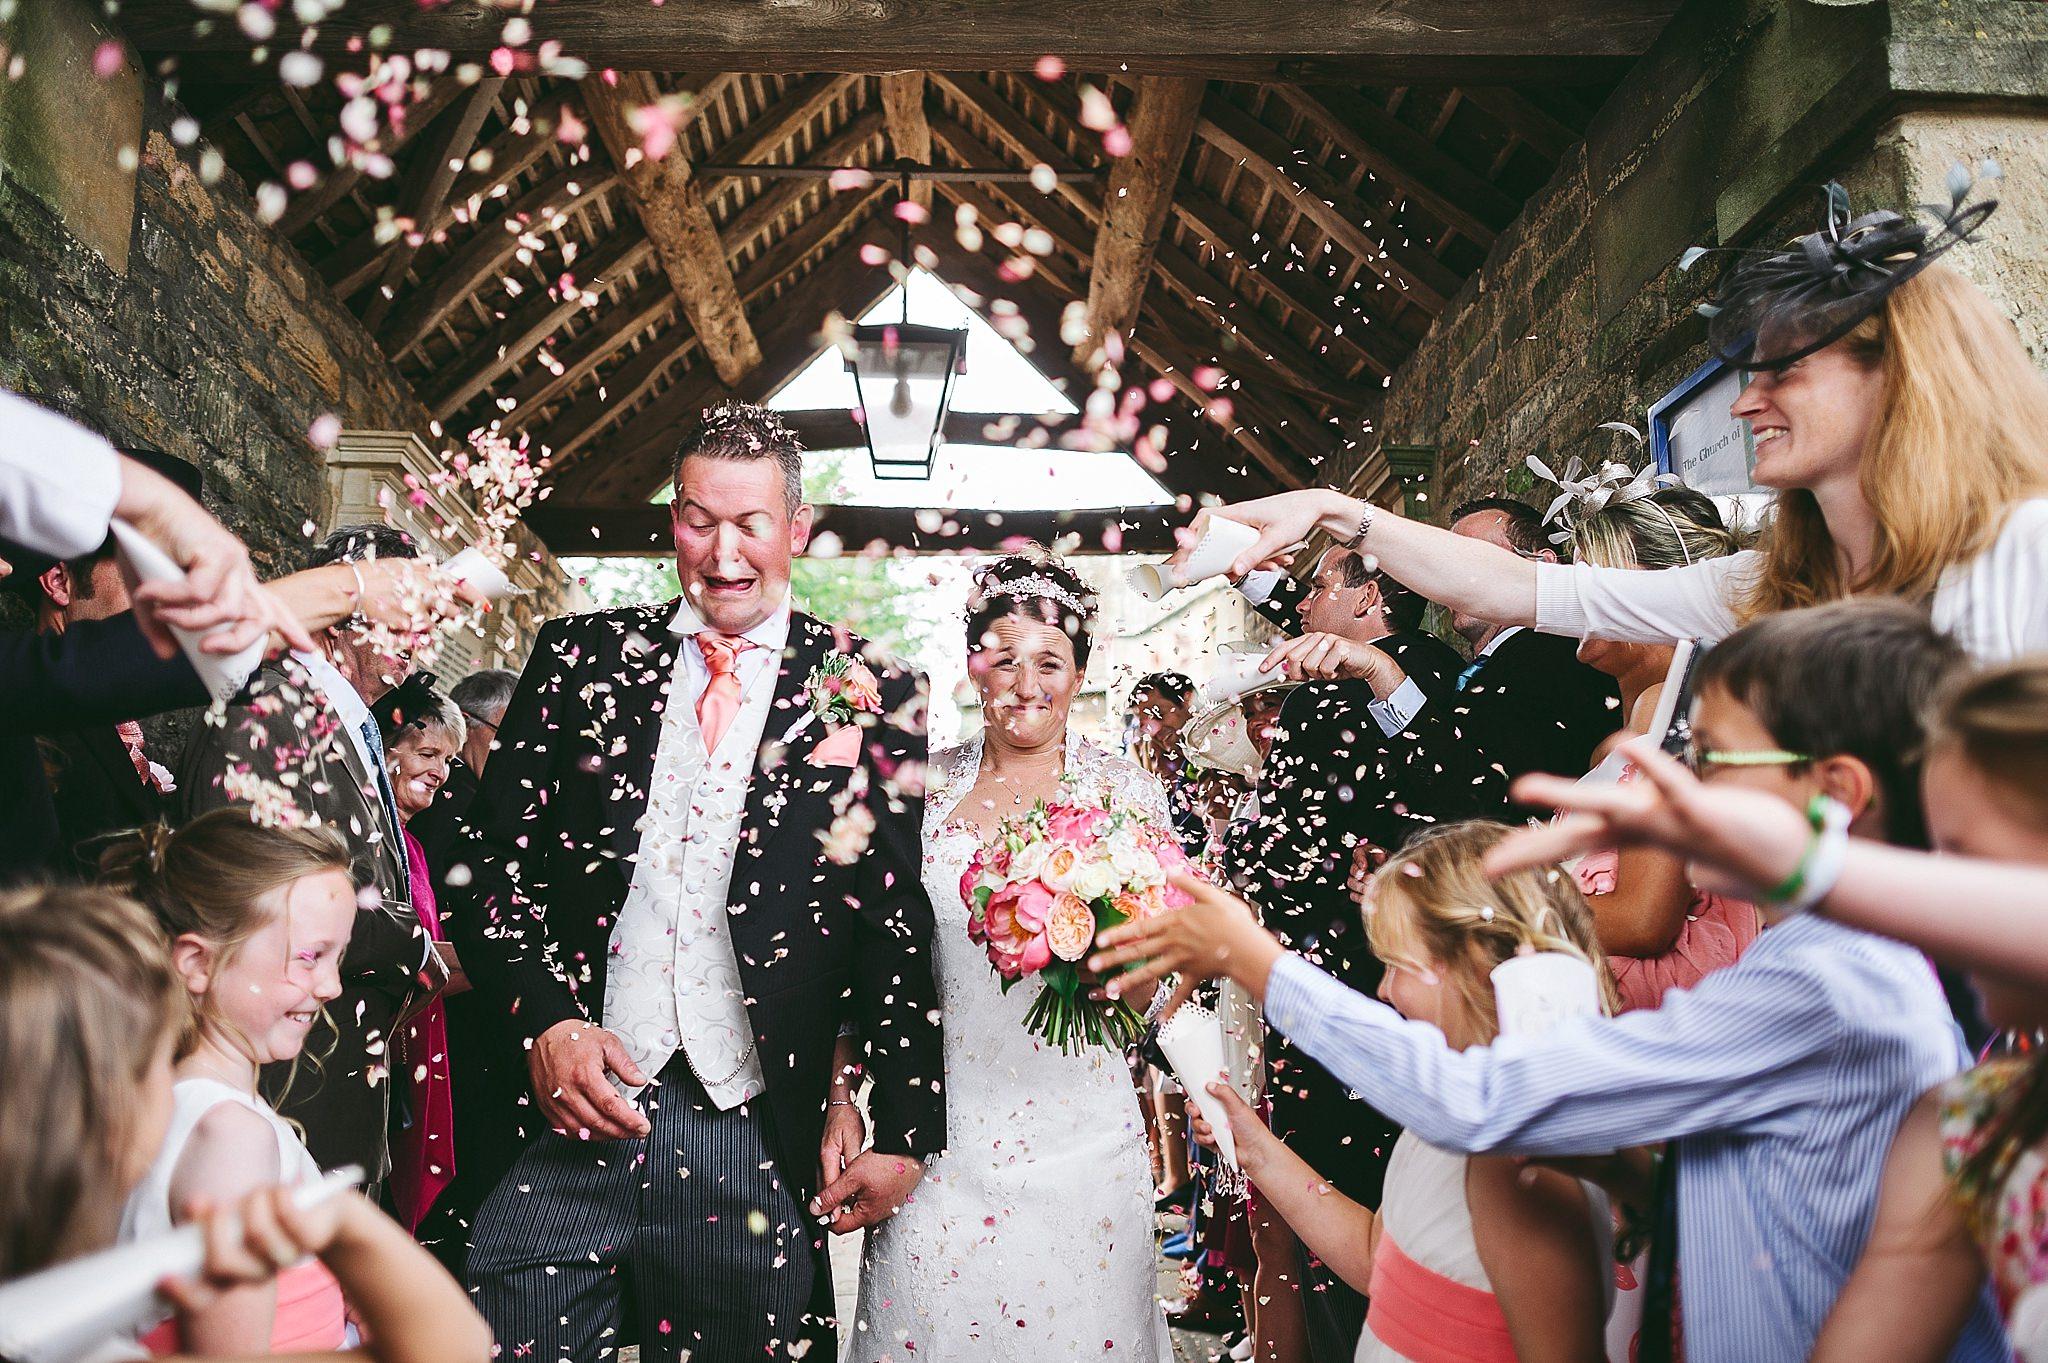 aga-tomaszek-wedding-photographer-cardiff-2016_1029